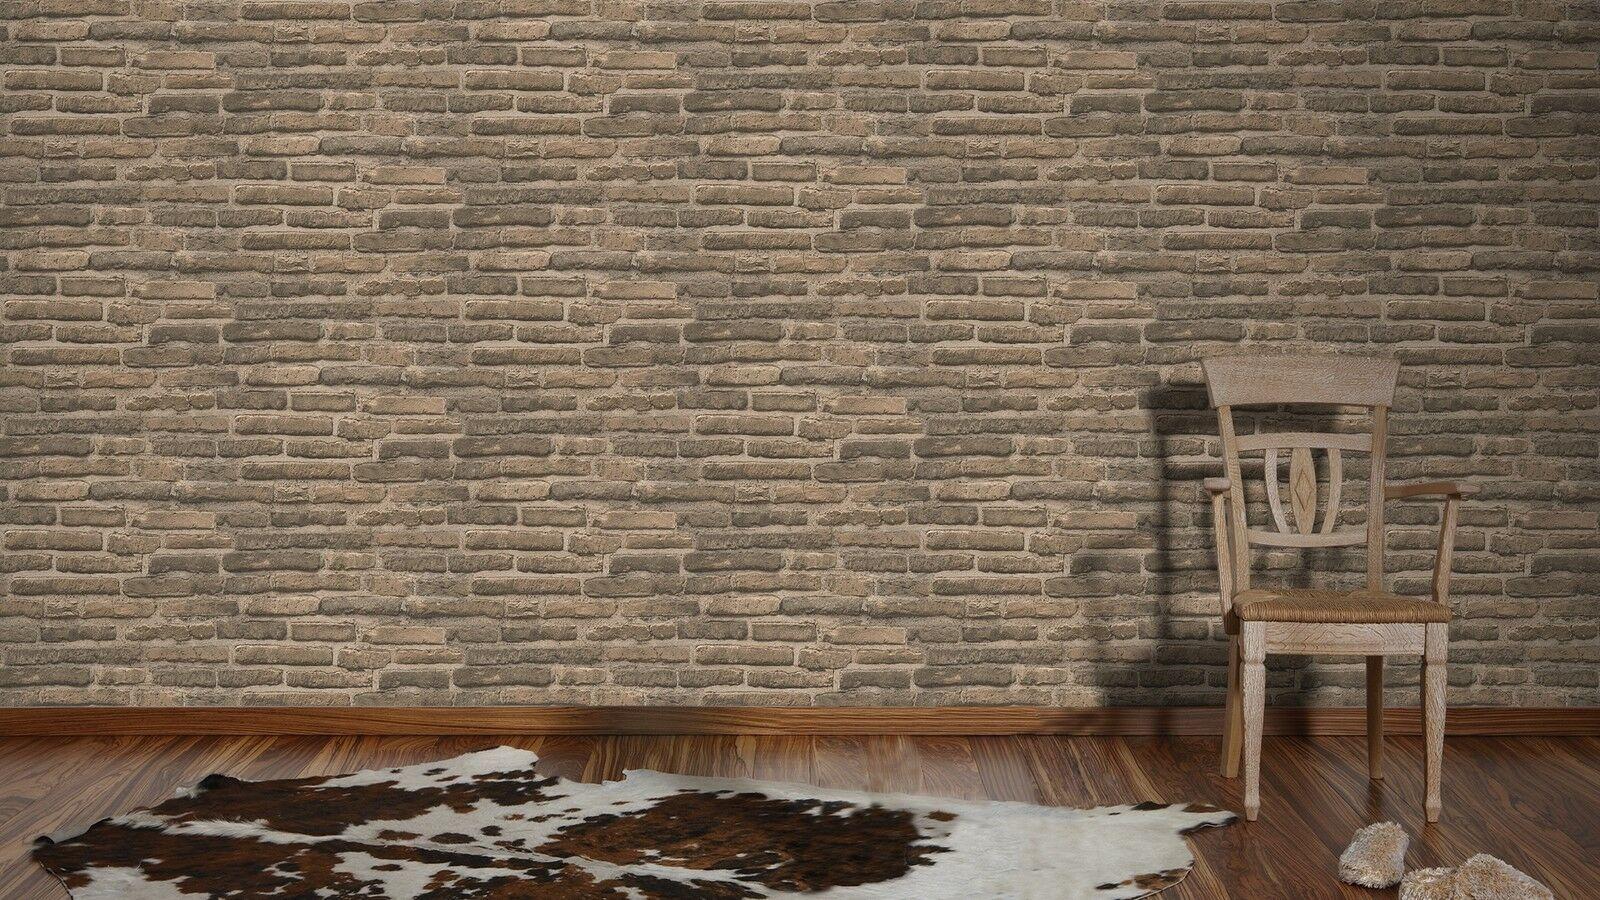 grau weie tapete best gnstige solide einfache moderne mode vertikale streifen rosa grau tapete. Black Bedroom Furniture Sets. Home Design Ideas